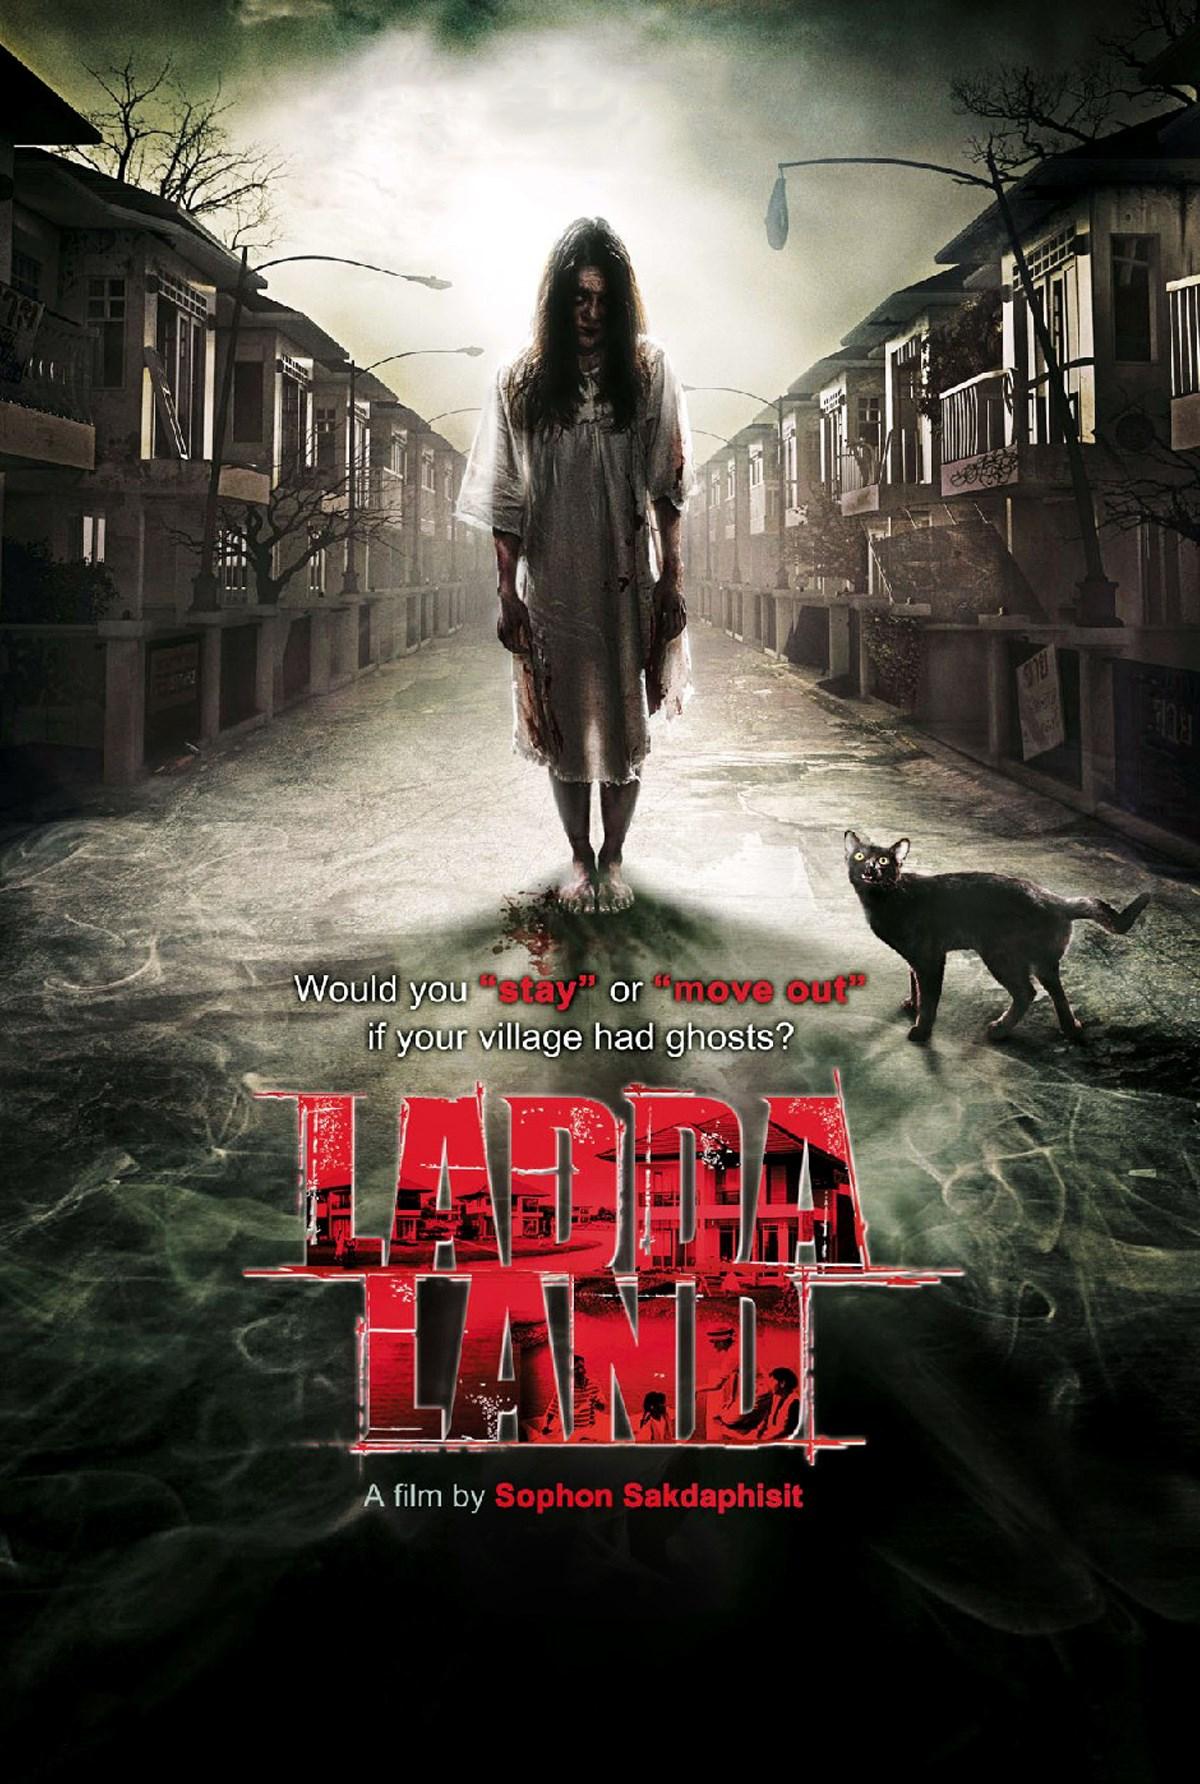 Subscene - Subtitles for Ladda Land